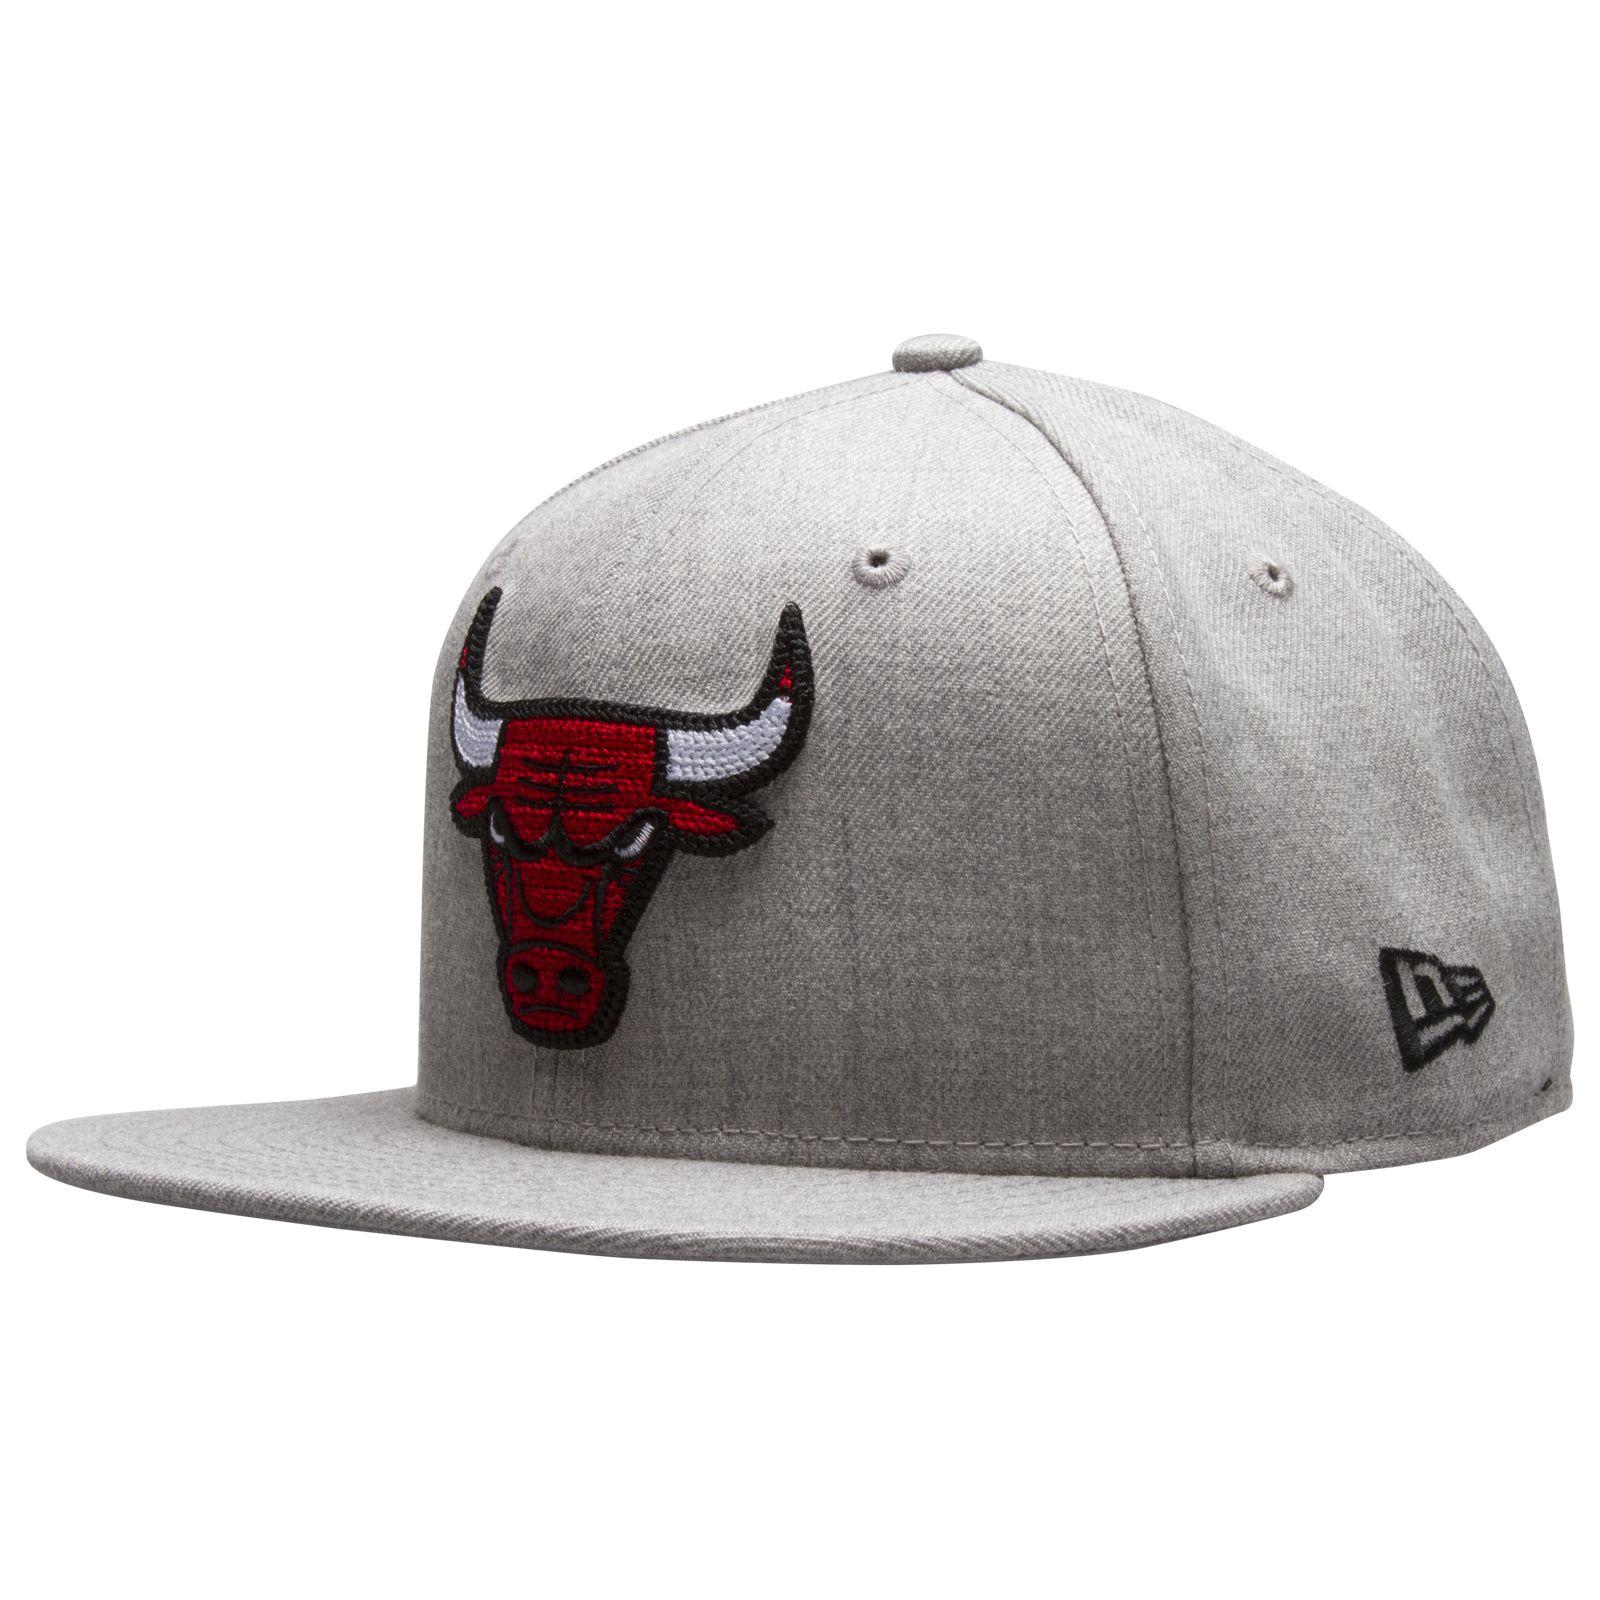 size 40 175bd 00601 Chicago Bulls Heather Grey Cross-Stitch Bull Logo Fitted Flat Bill Hat by New  Era  Chicago  Bulls  ChicagoBulls